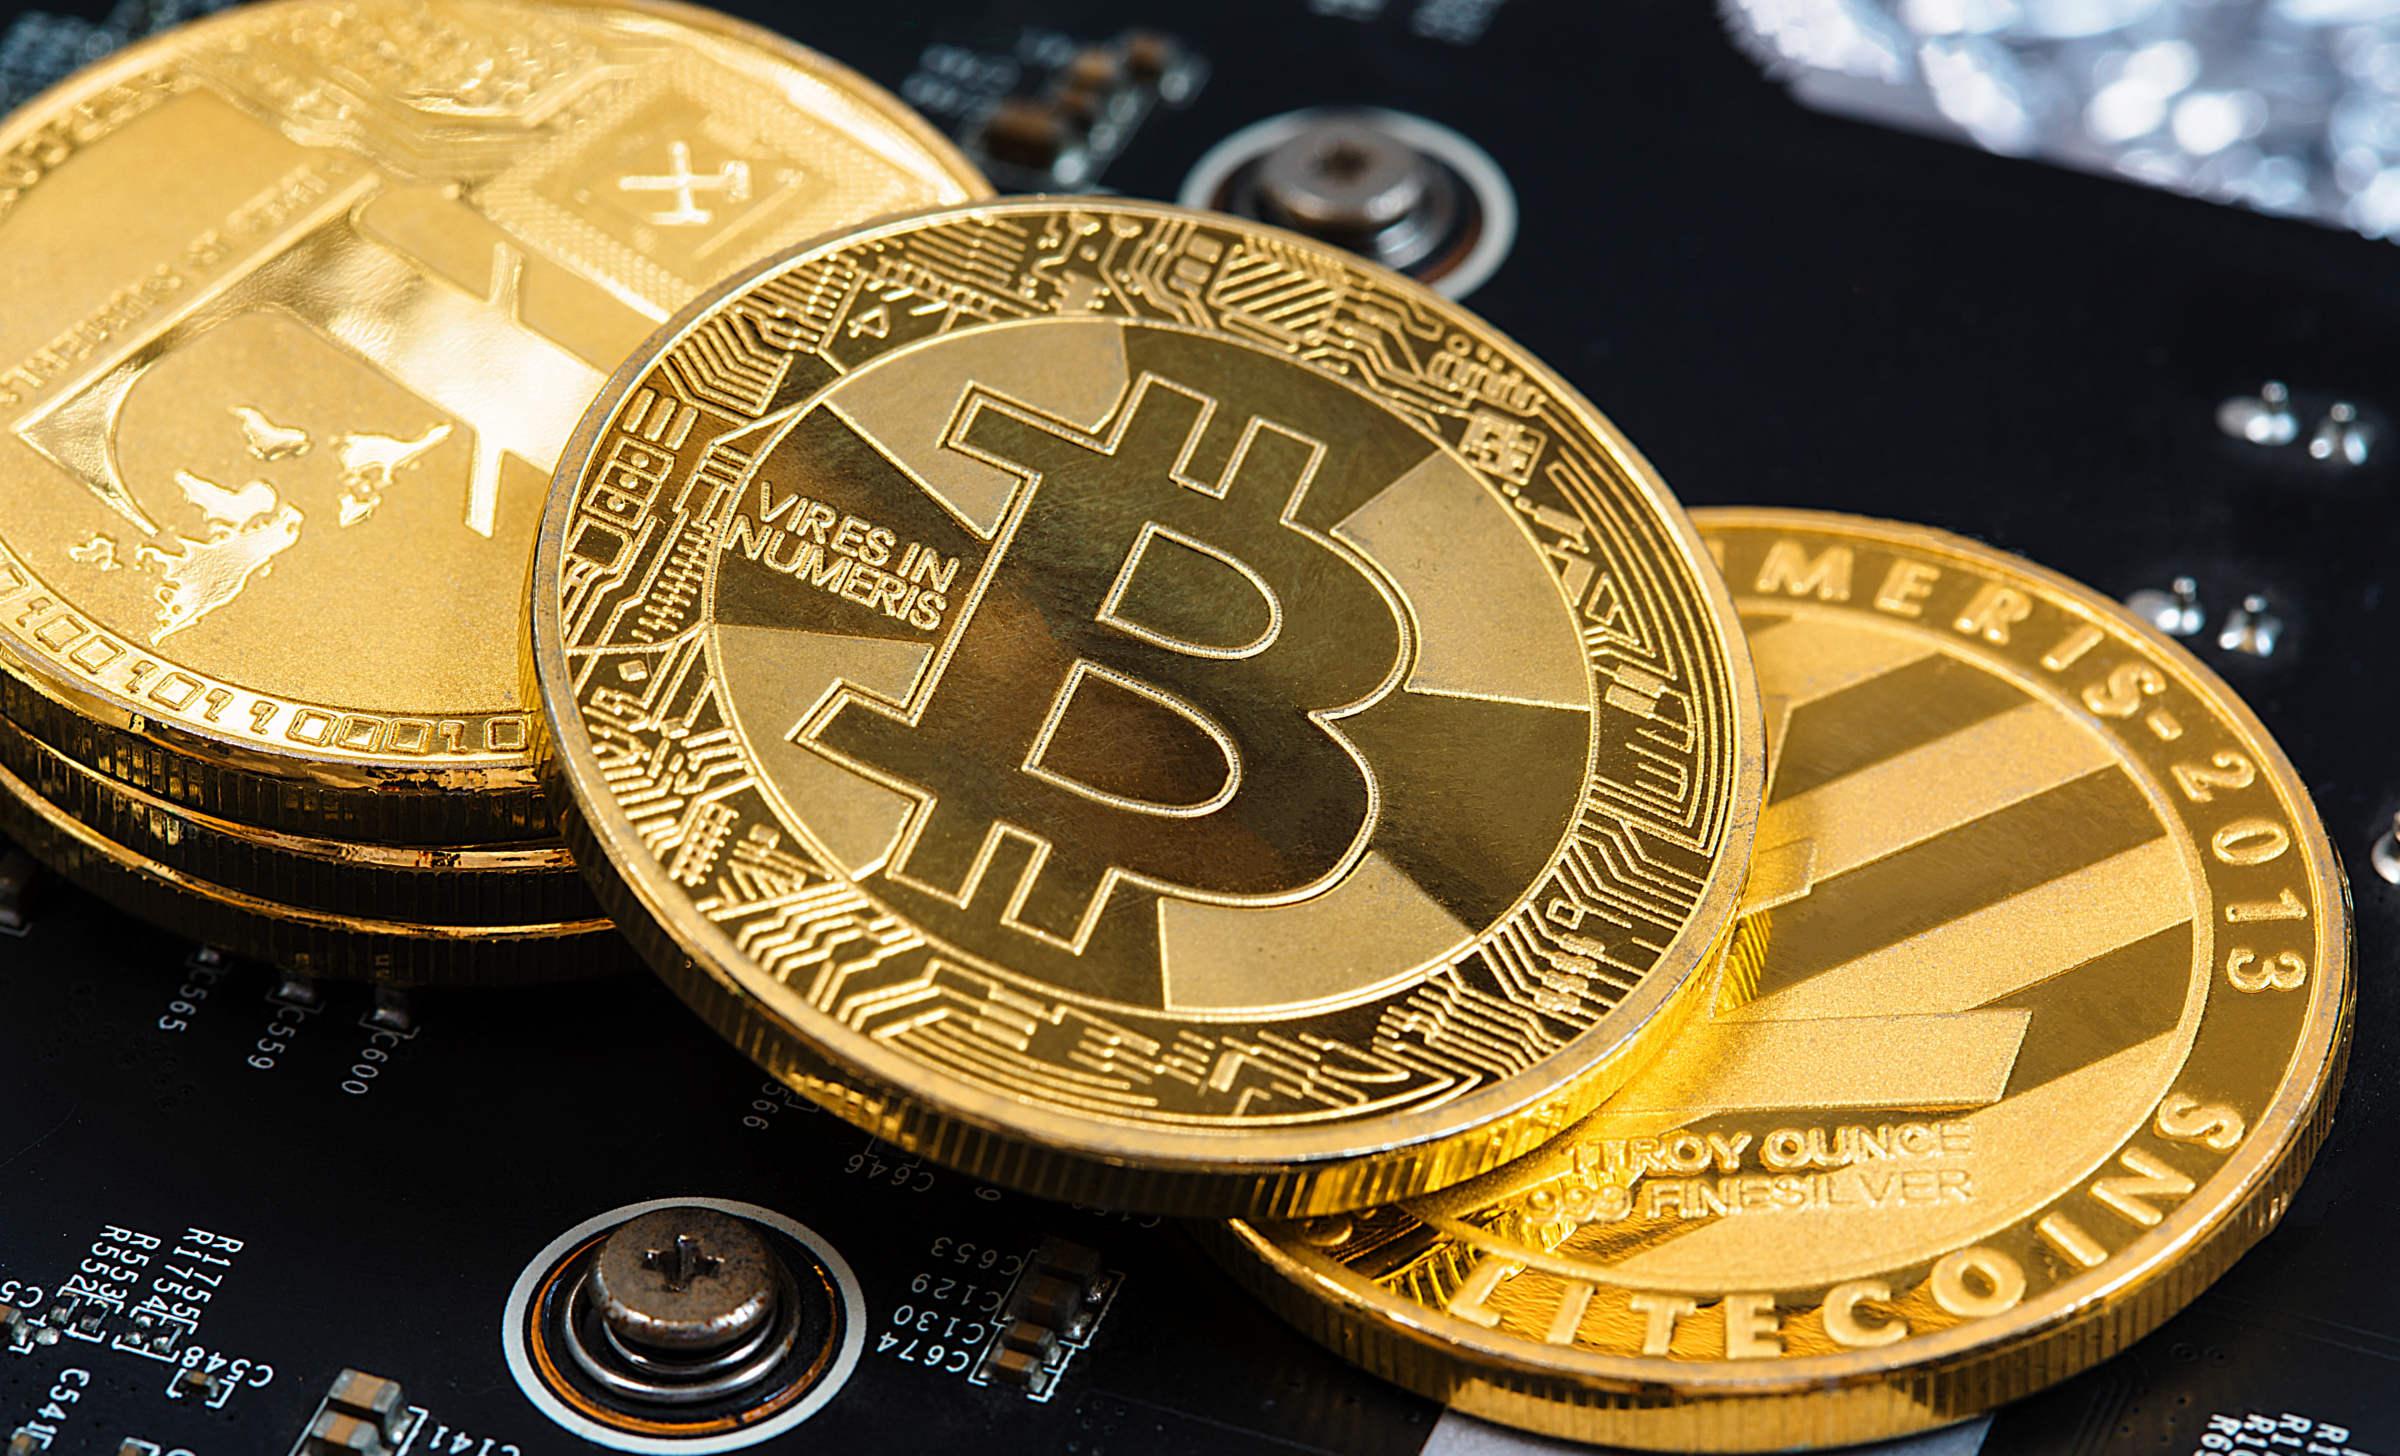 Luciano Bitcoin